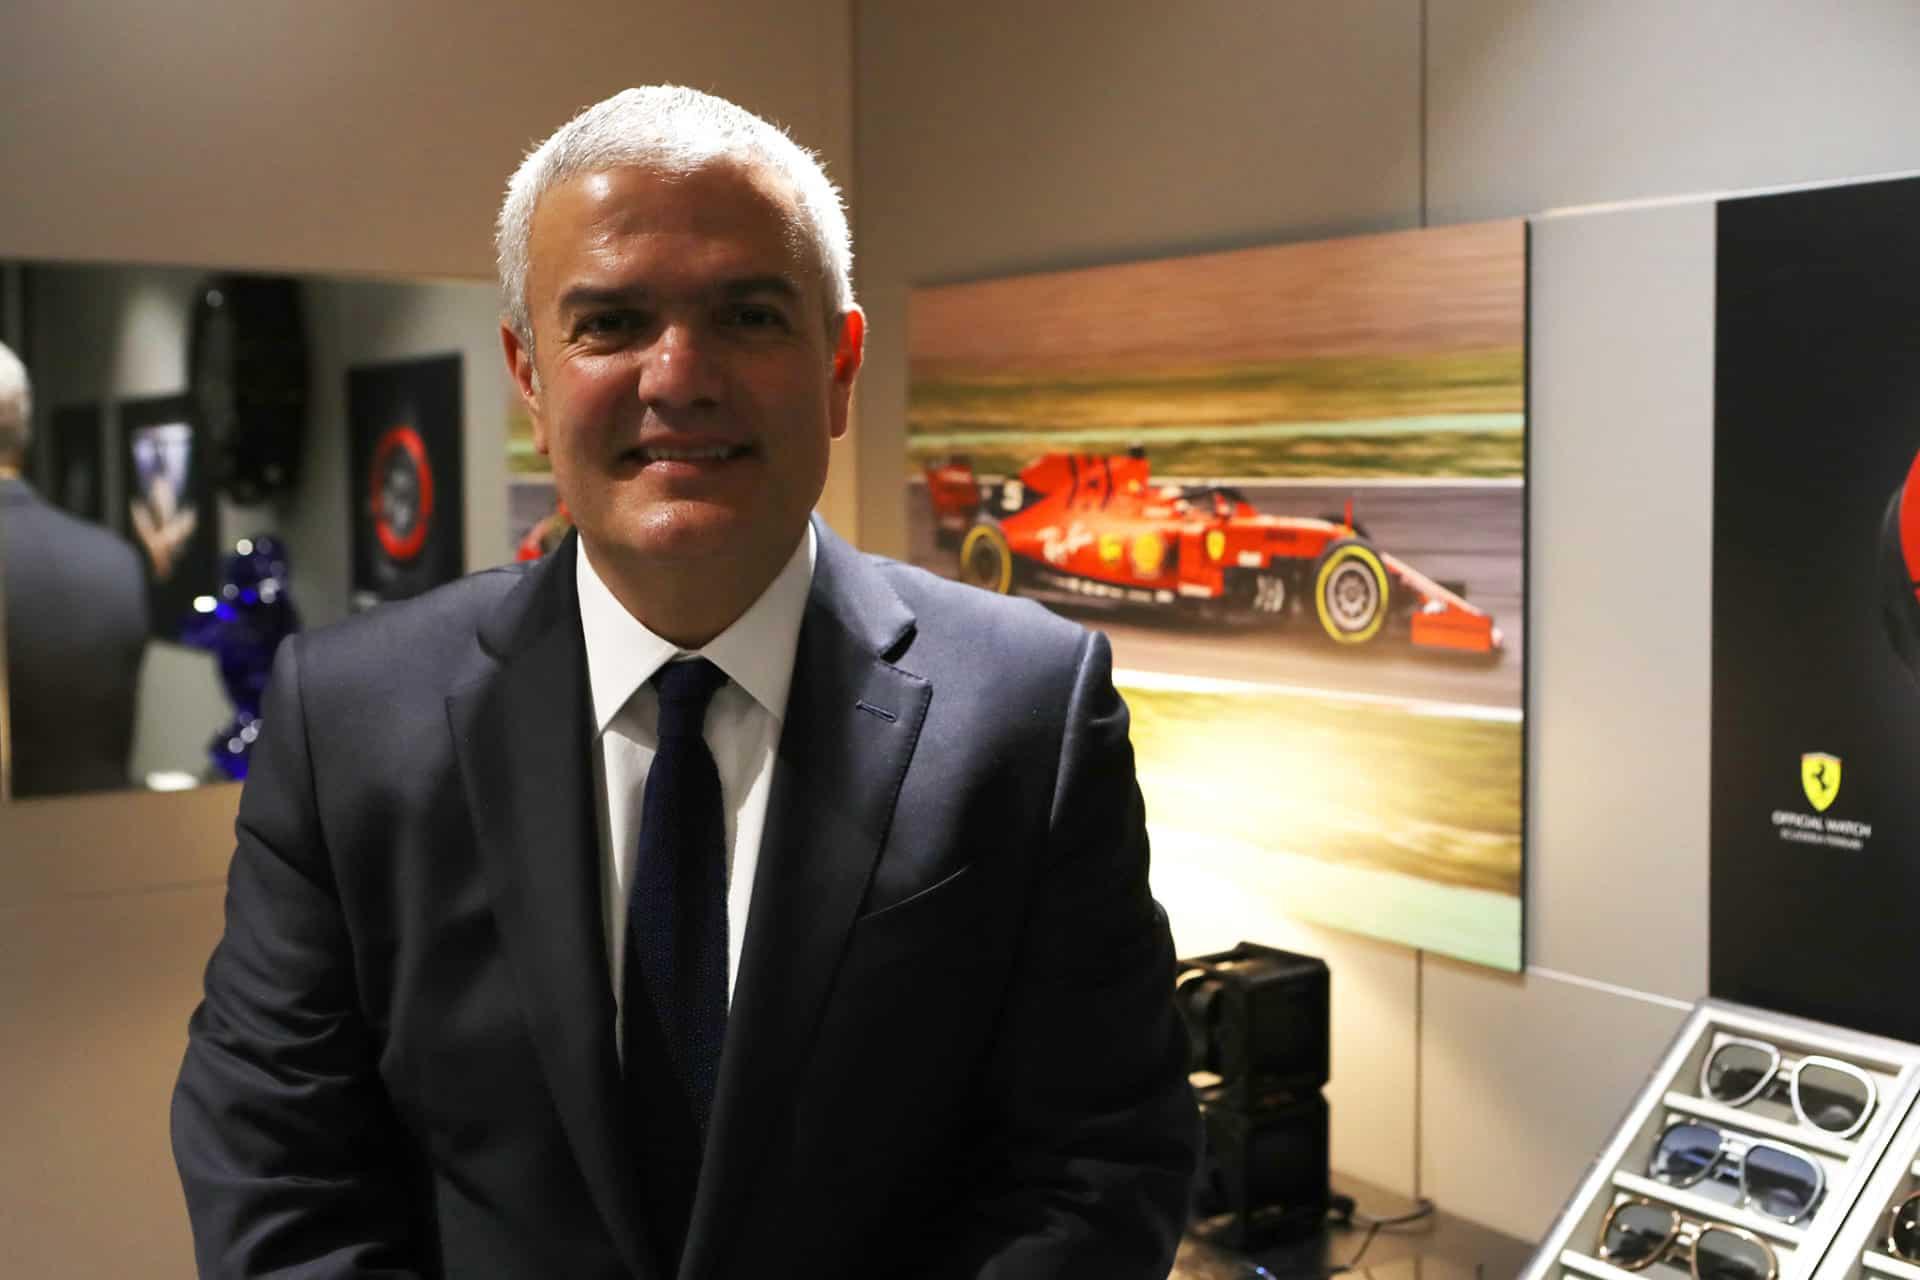 Der CEO der großen Uhrenbrand Hublot Ricardo Guadalupe